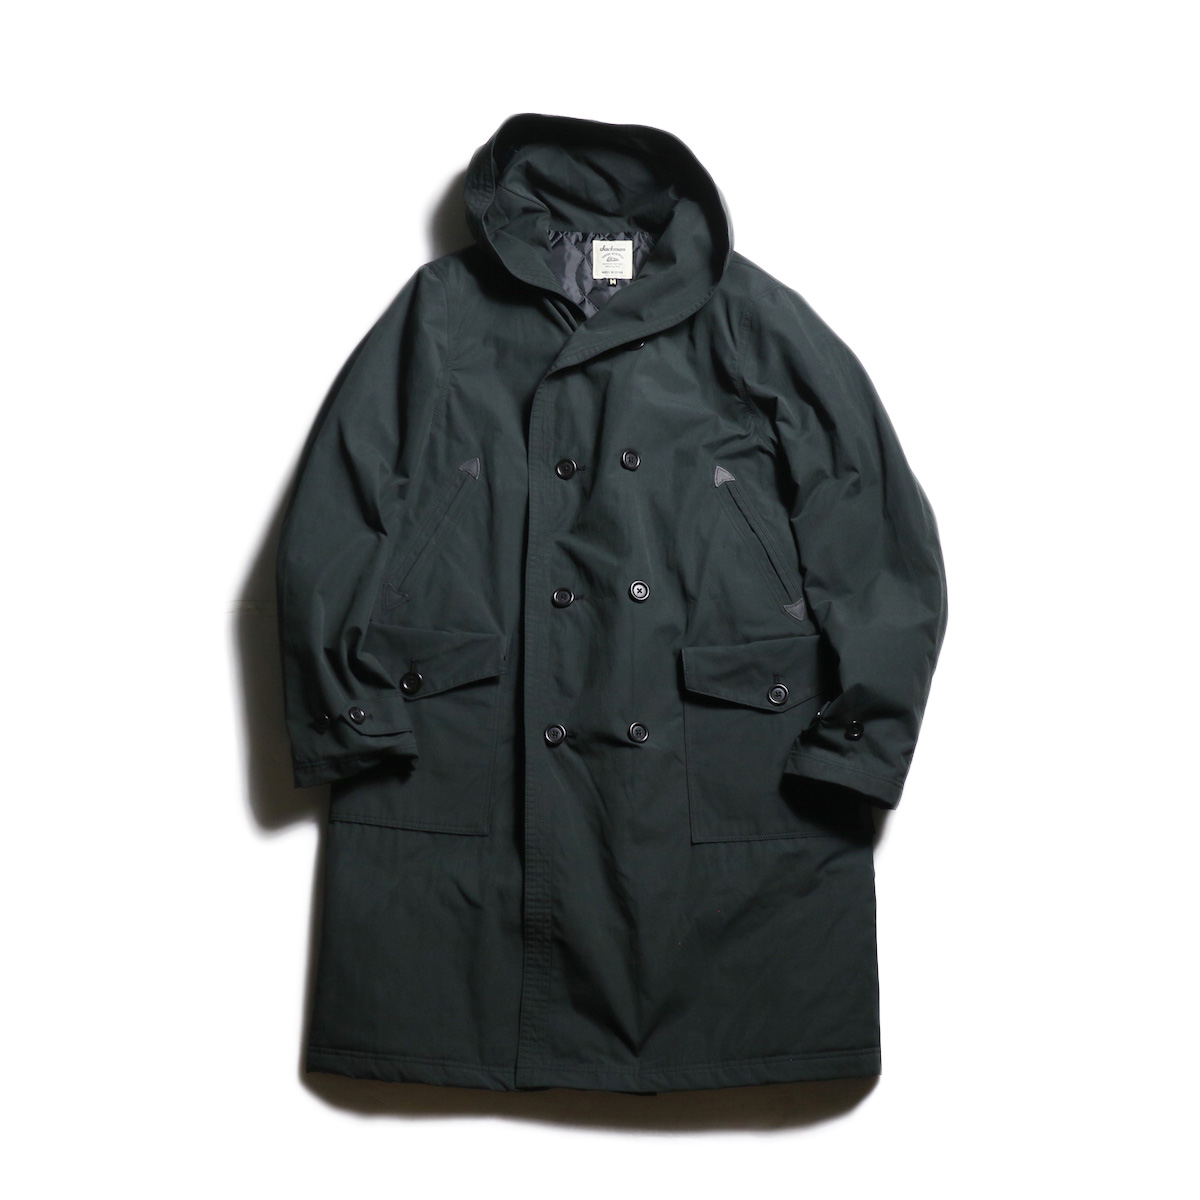 Jackman / Spectator Coat (Sumikuro)